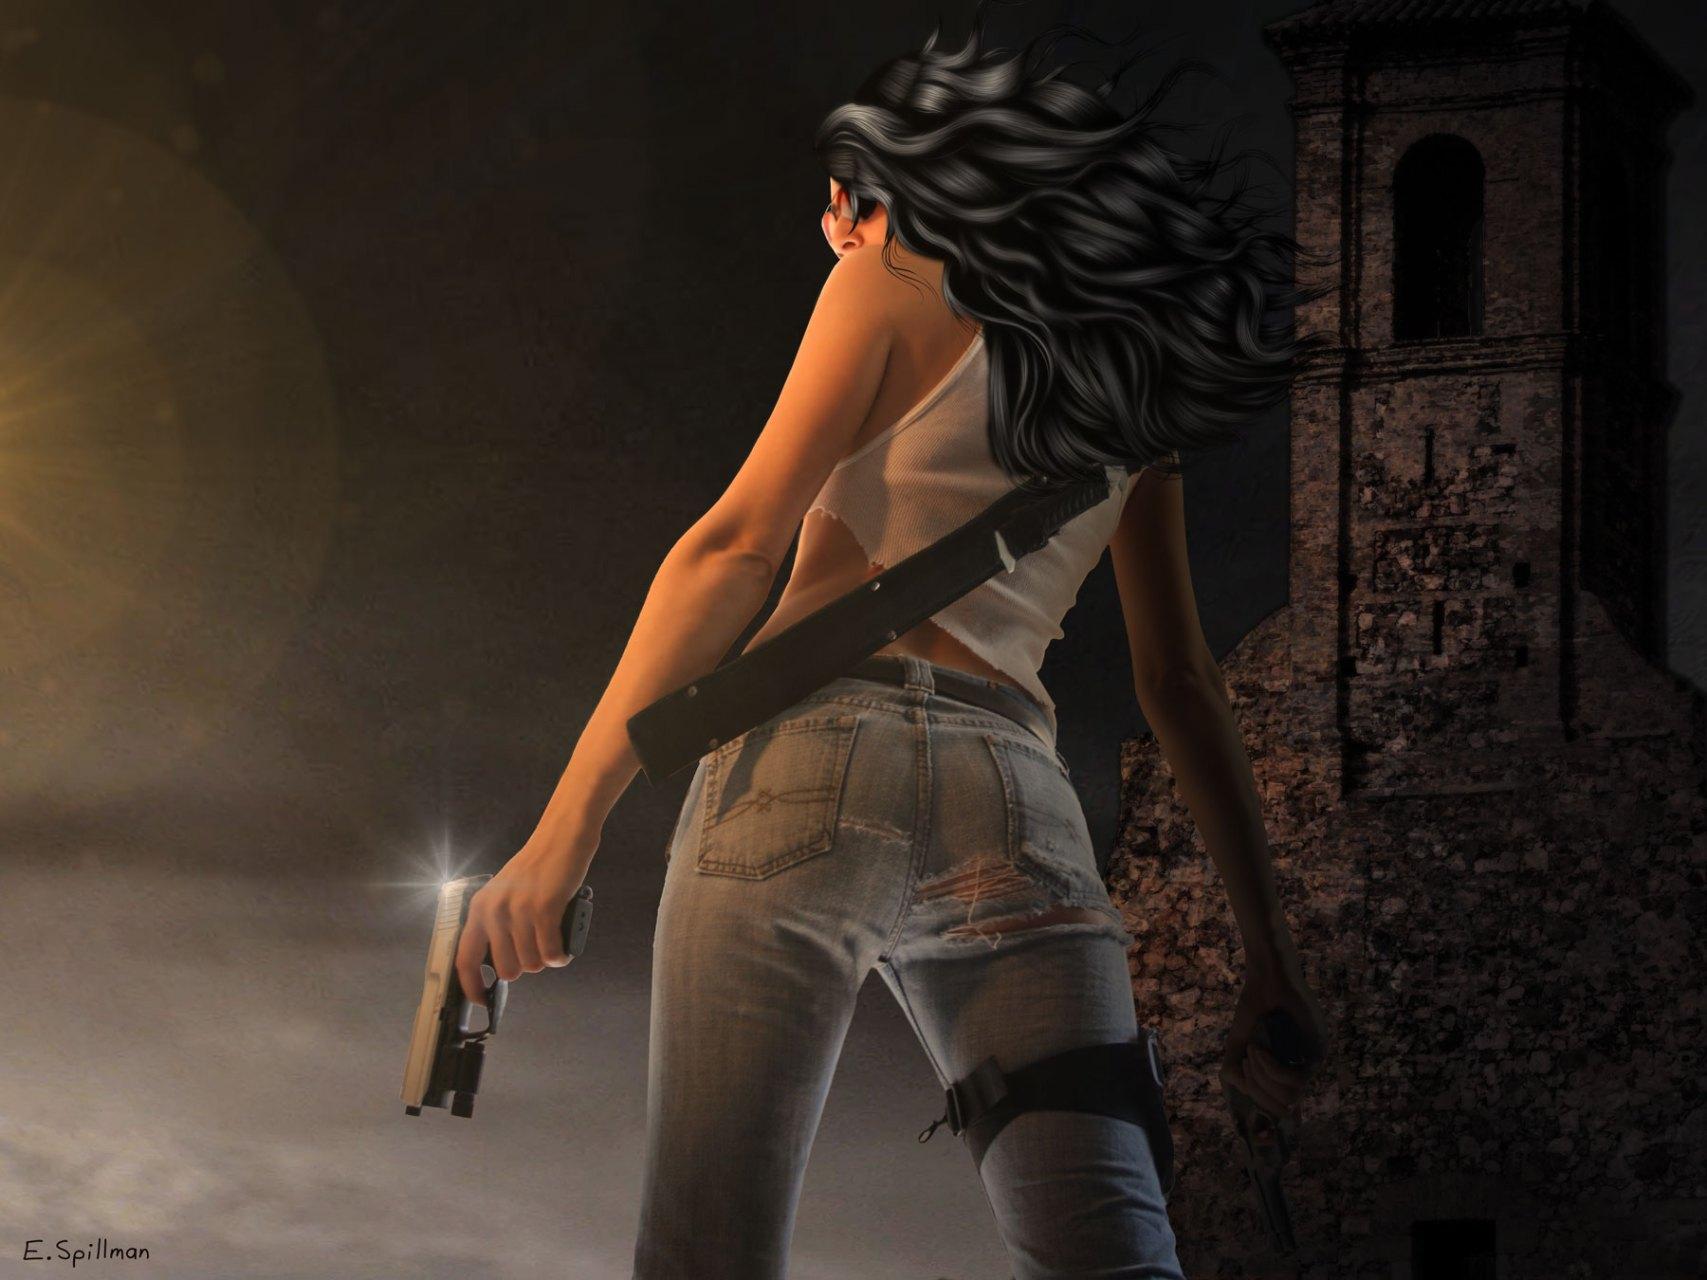 Zombie Hunter by E.C. Spillman